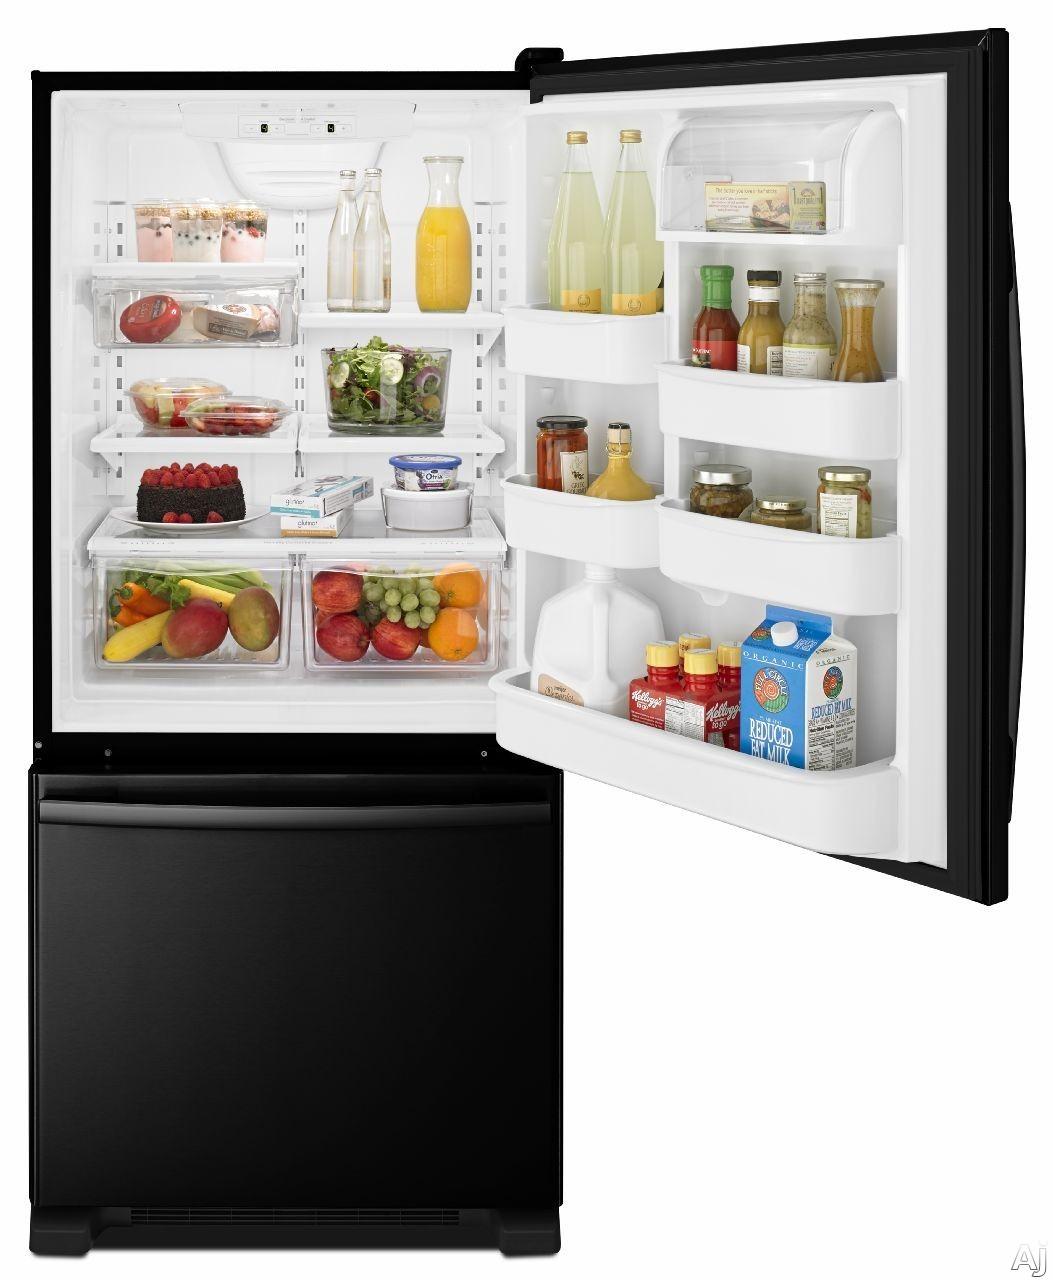 Amana ABB1924BRB 185 cu ft Bottom Freezer Refrigerator with Spillsaver Glass Shelves Two Crisper Drawers Temp Assure Freshness Controls Gallon Door Storage and Pull Out Freezer Drawer Black